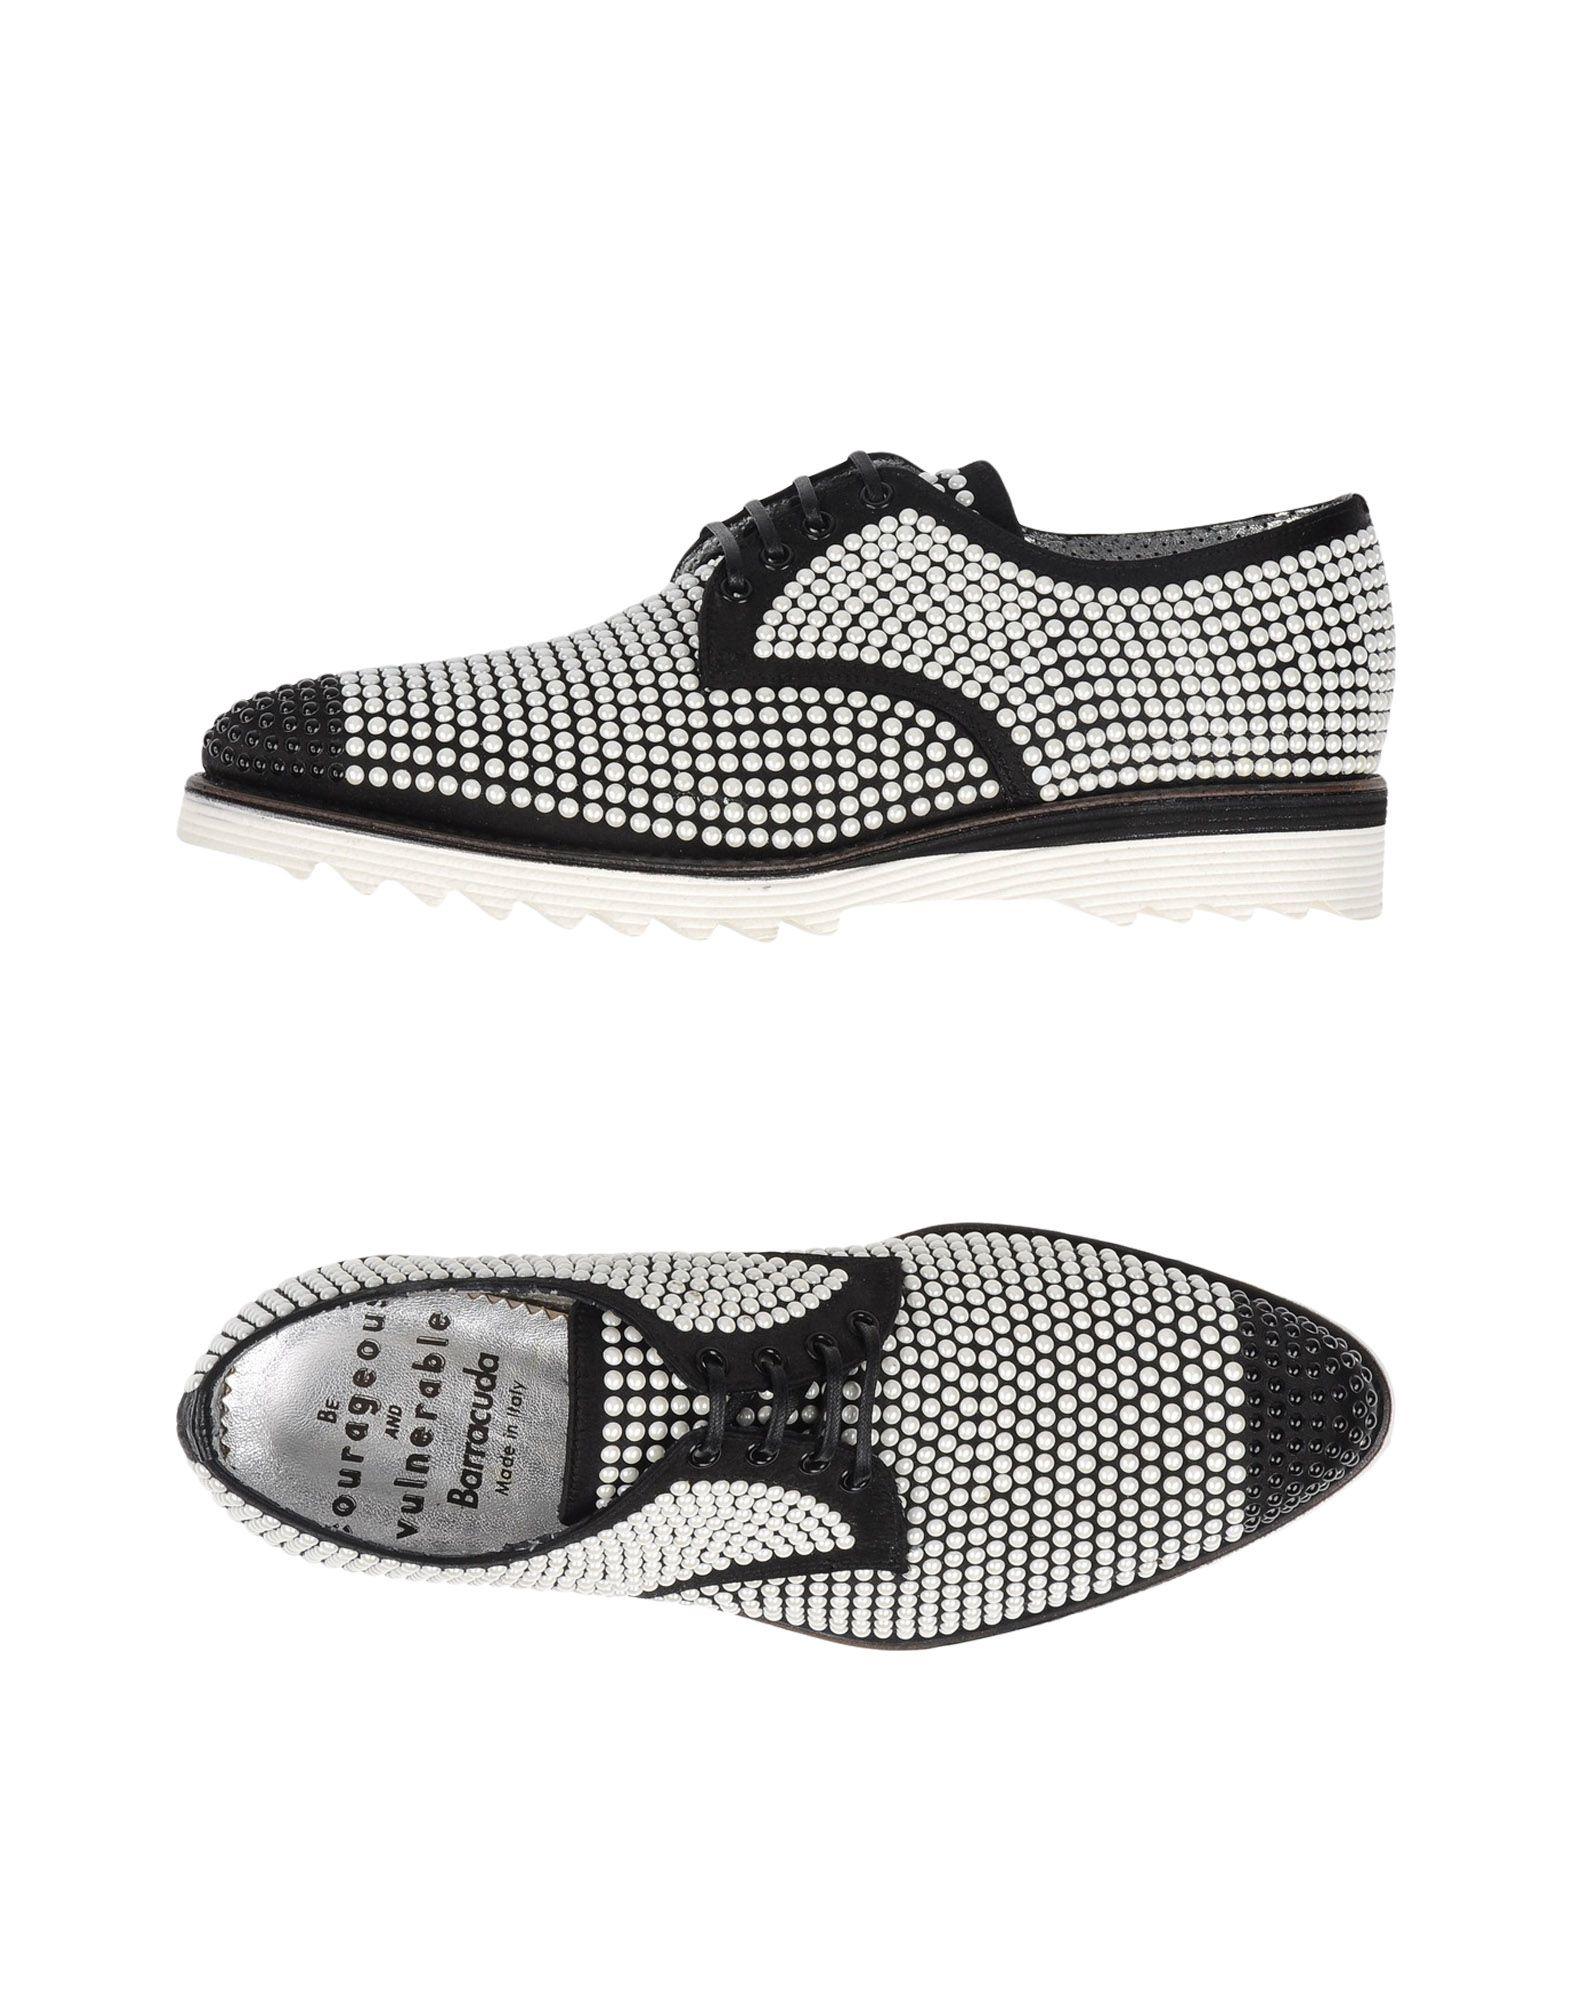 Zara Lace Up Flat Satin Shoes   Black